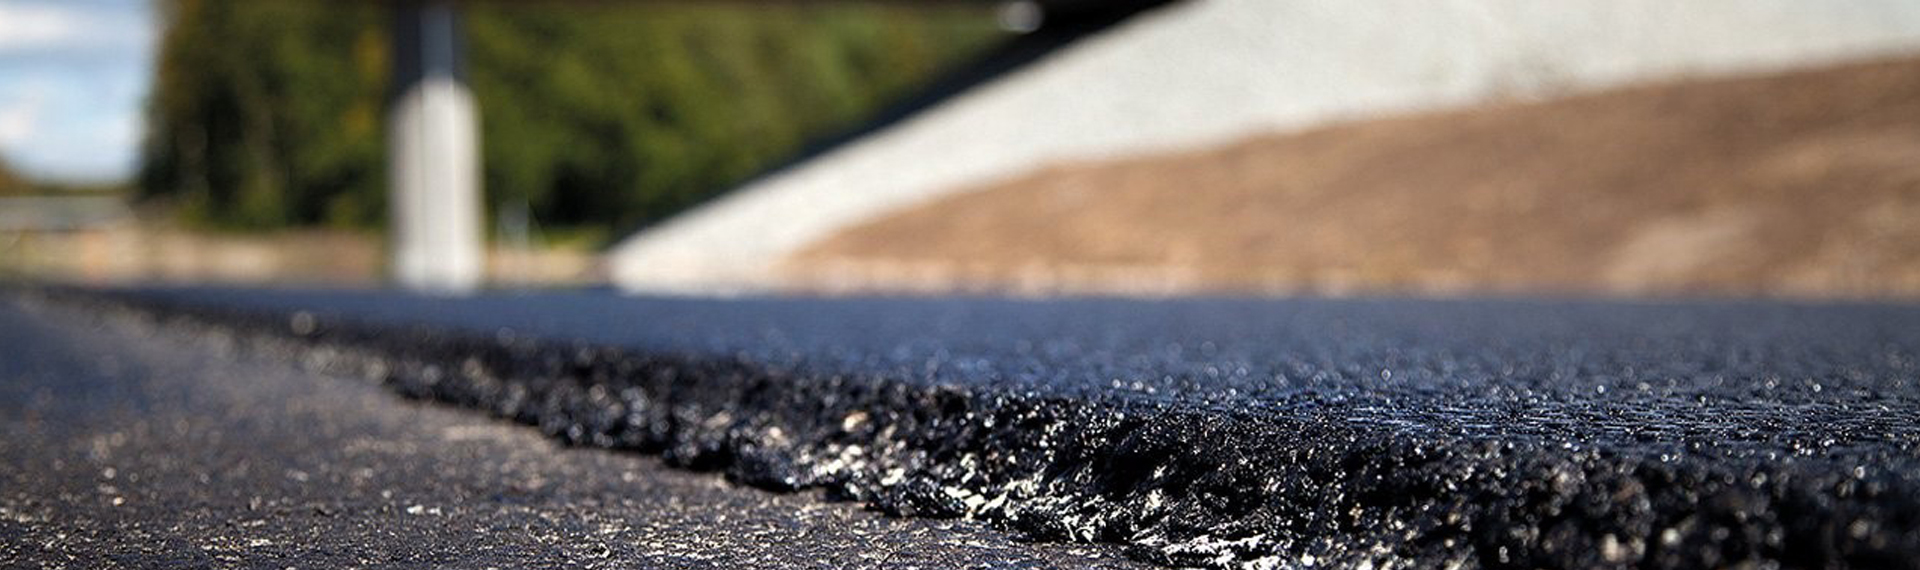 Dynapac innovates tougher design to take on thin asphalt and abrasive aggregates